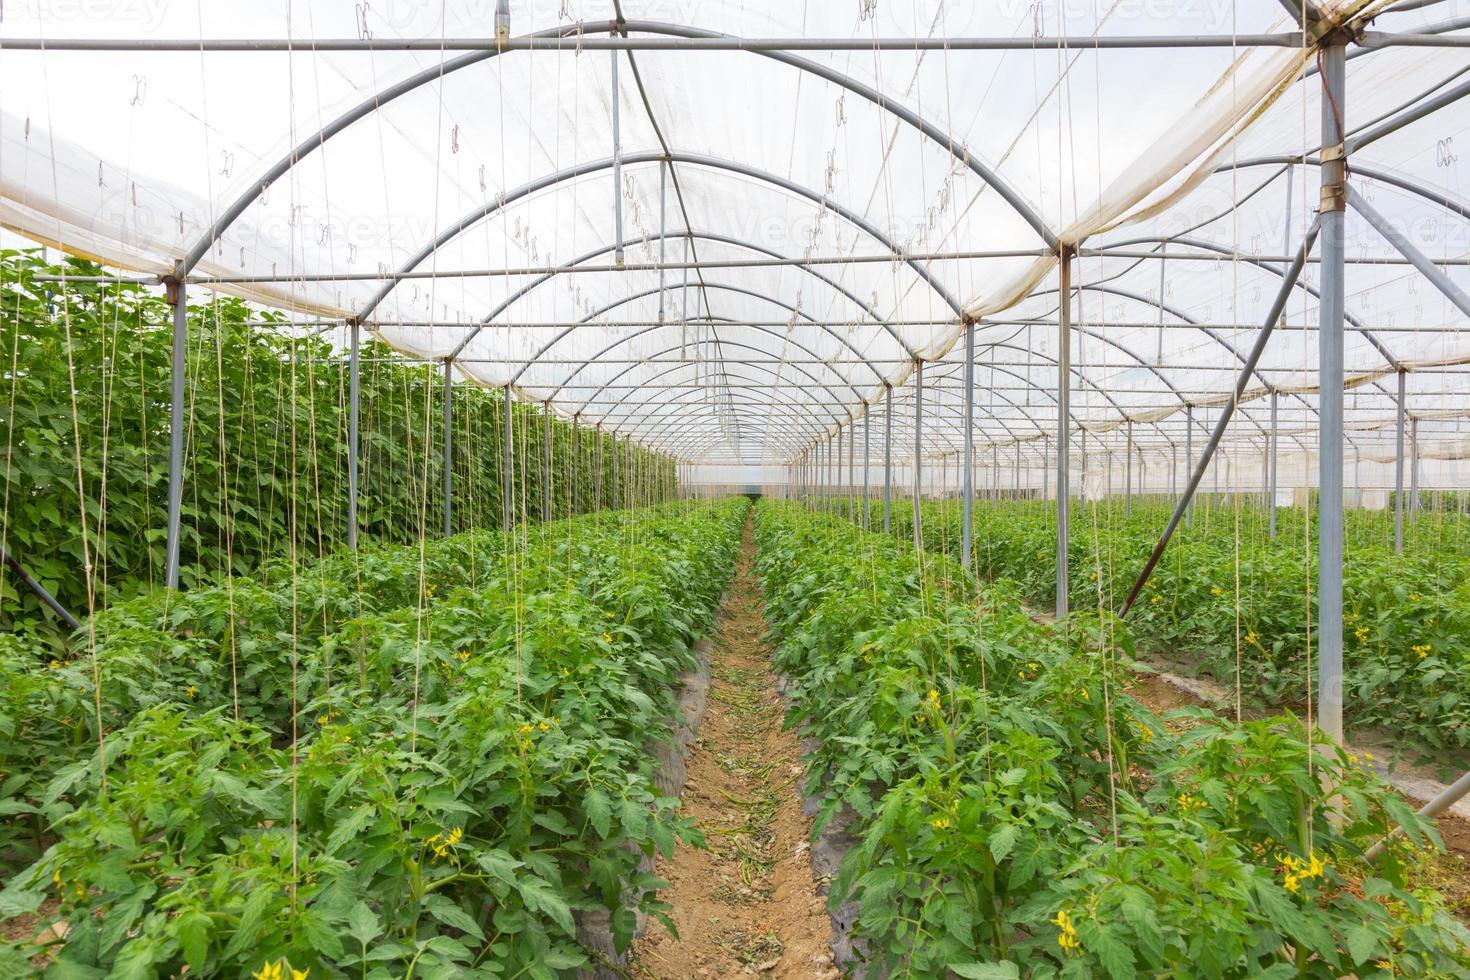 tomates bio poussant en serre. photo